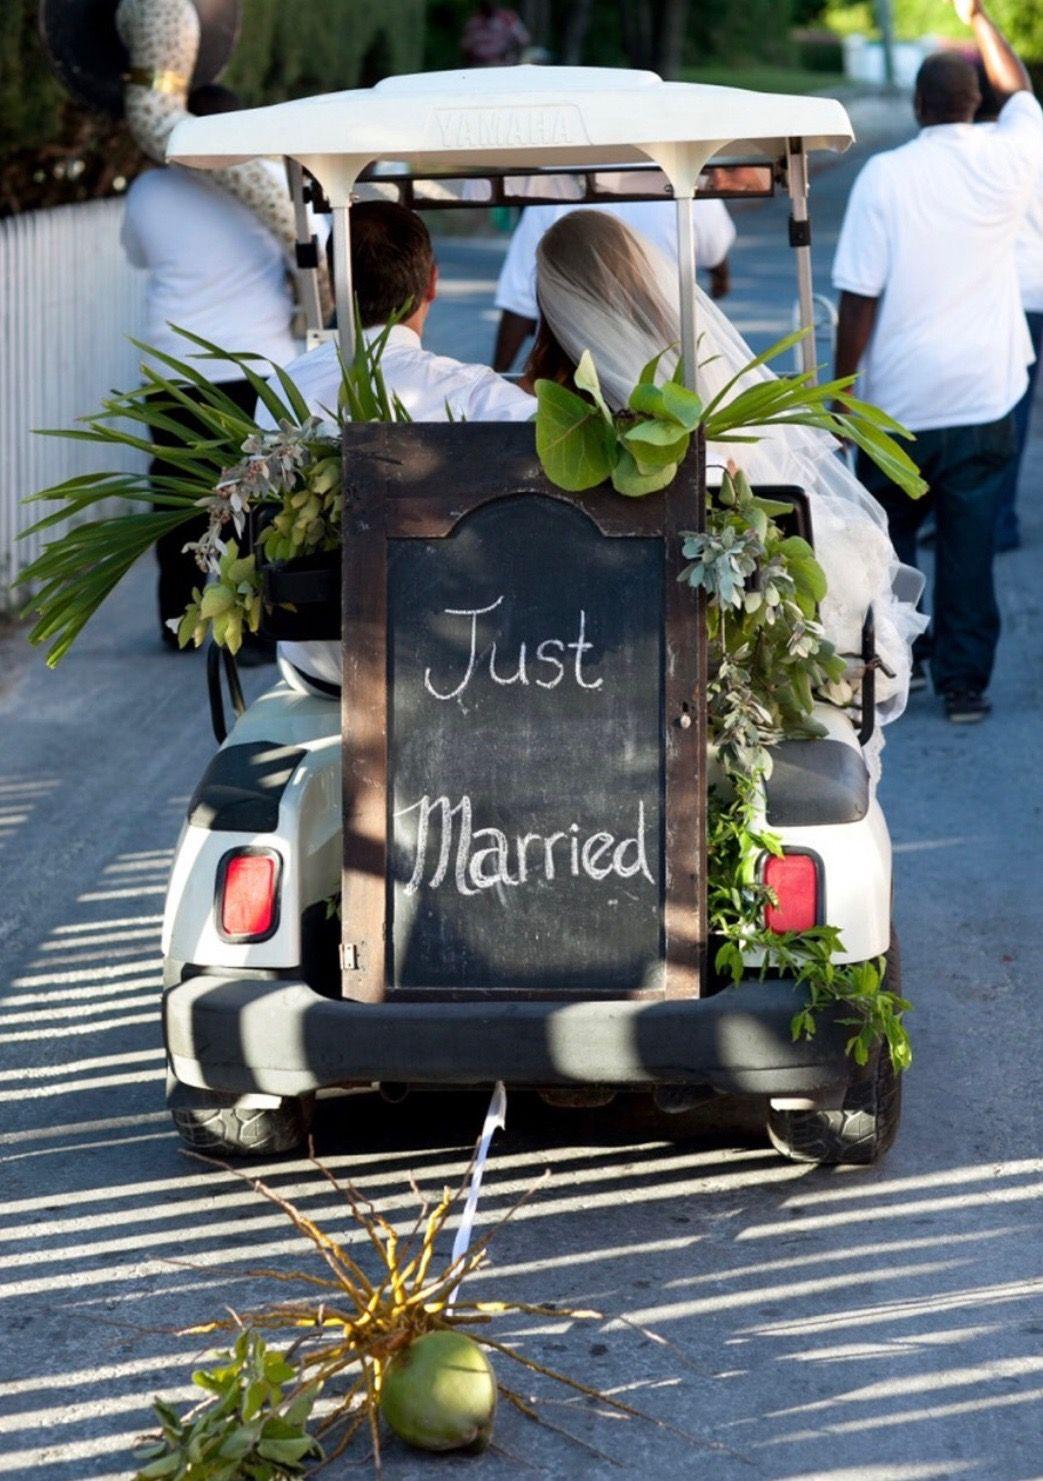 Pin by Joy Gallardo on Wedding Stuff Just married, Just